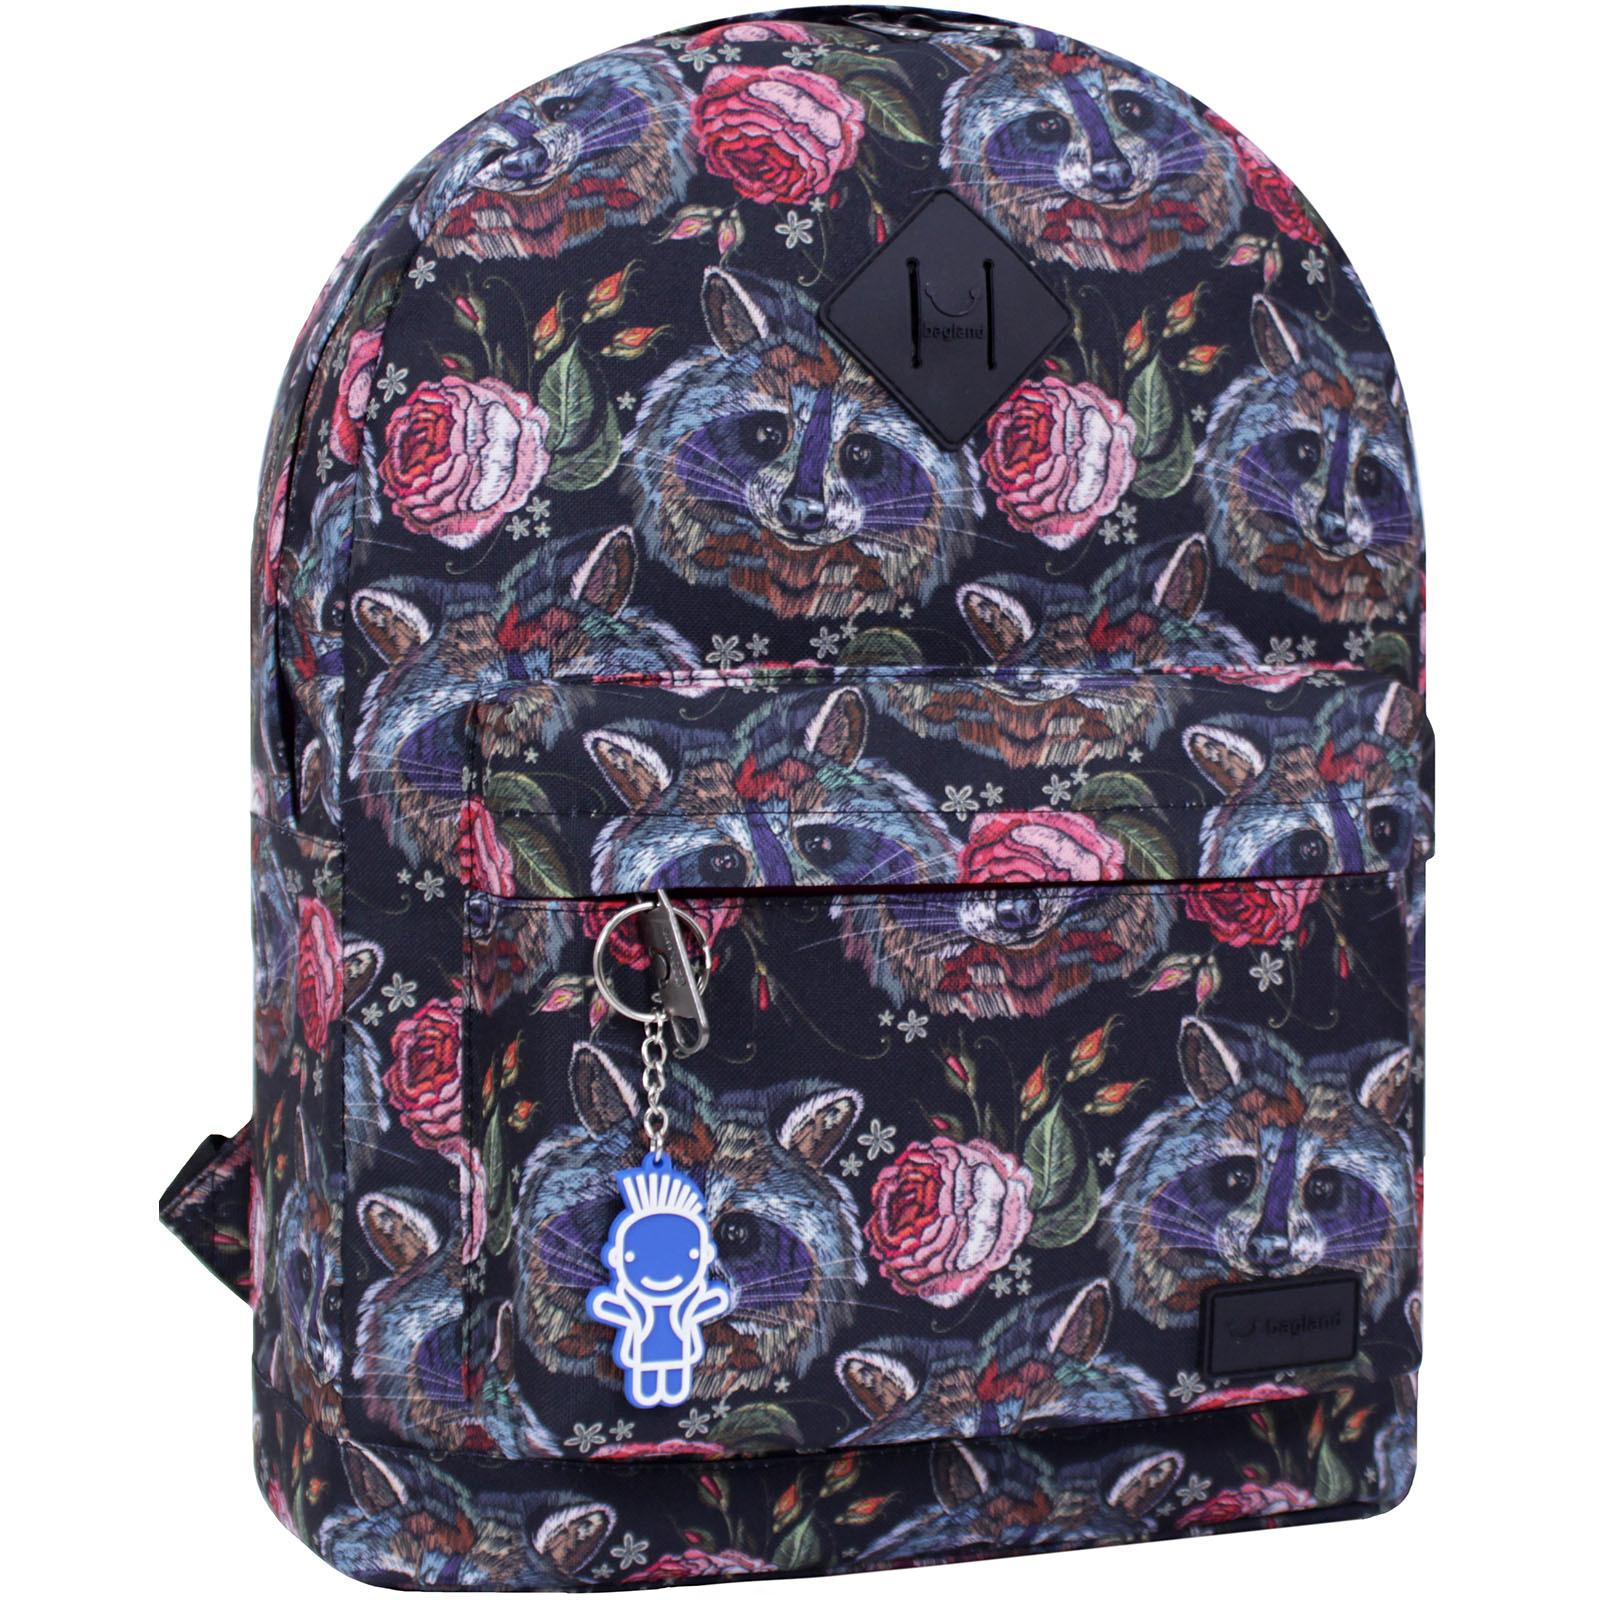 Городские рюкзаки Рюкзак Bagland Молодежный (дизайн) 17 л. сублімація 477 (00533664) IMG_3319_суб.477_.JPG